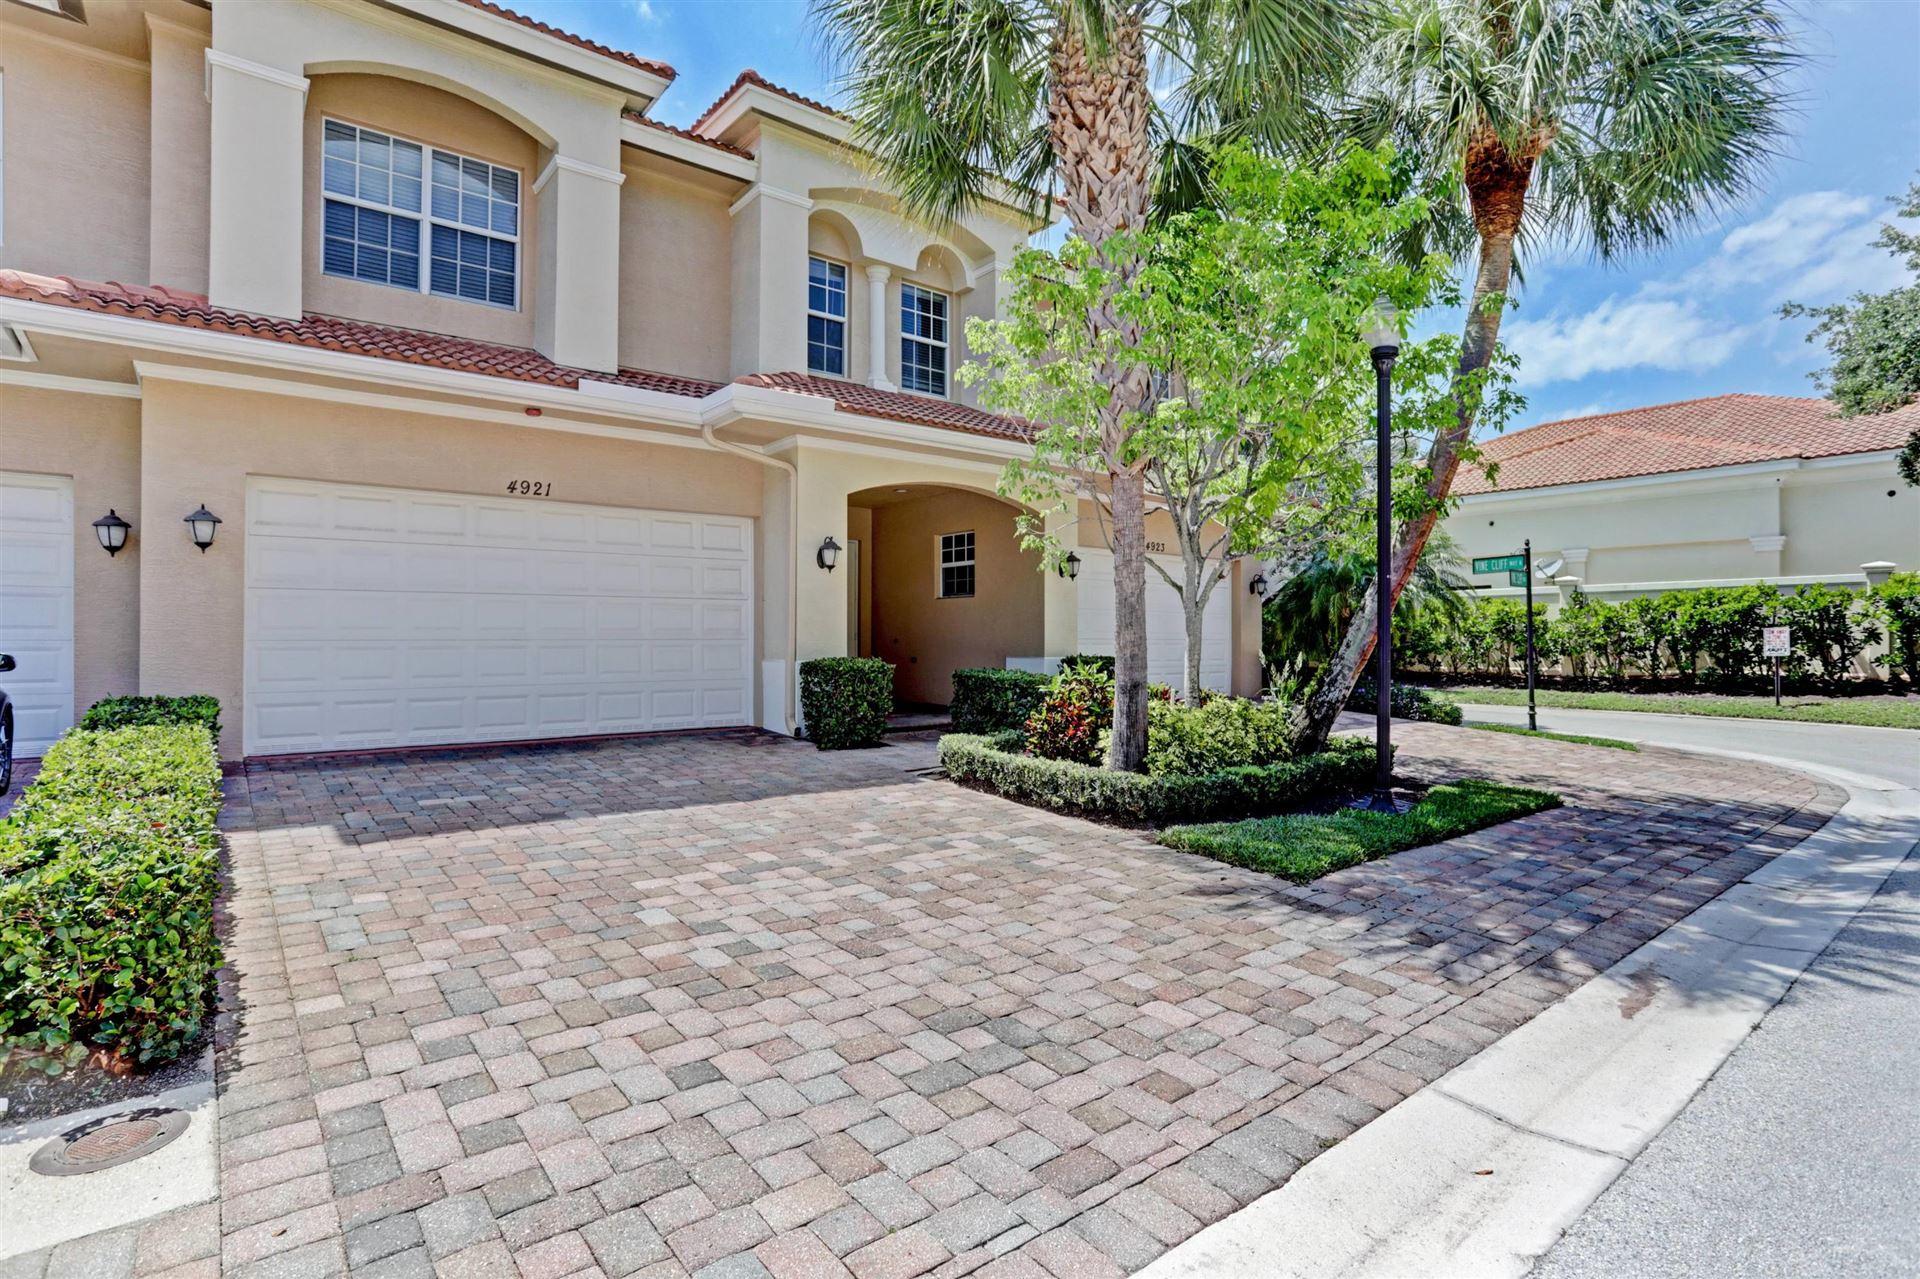 Photo for 4921 Vine Cliff Way E, Palm Beach Gardens, FL 33418 (MLS # RX-10714616)